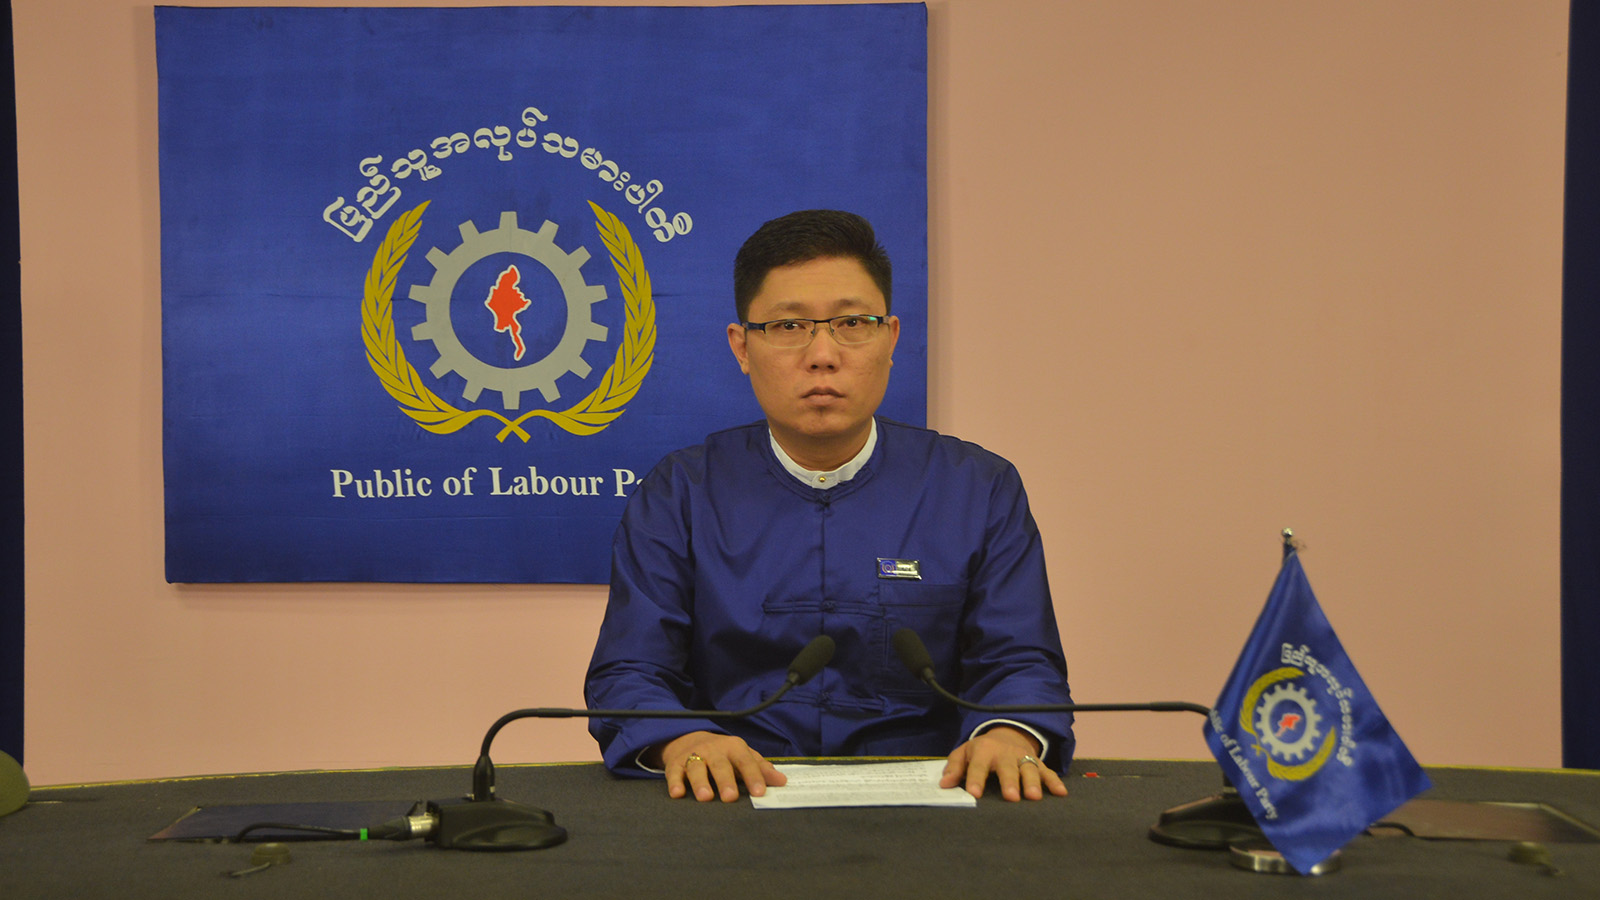 Chairman U Kyaw Zin of Public of Labour Party.